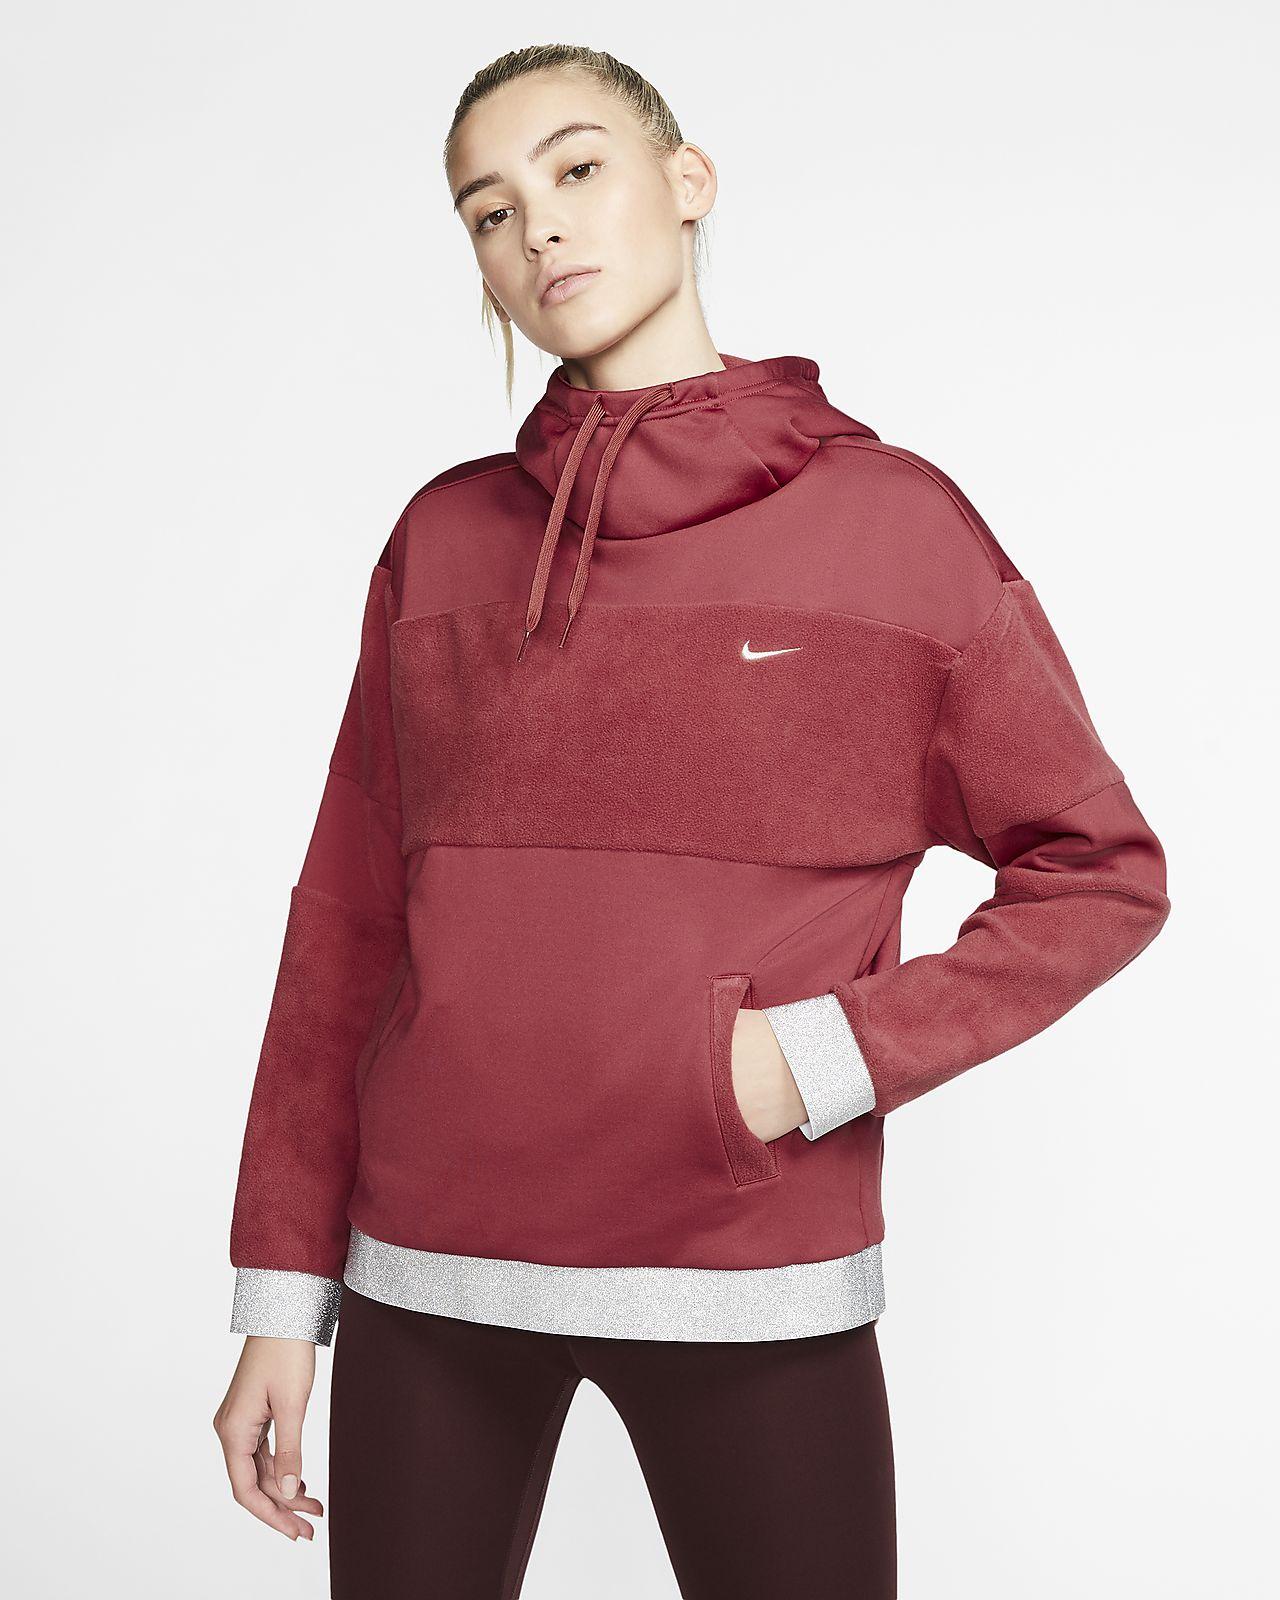 Nike Icon Clash belebújós kapucnis női polár edzőpulóver